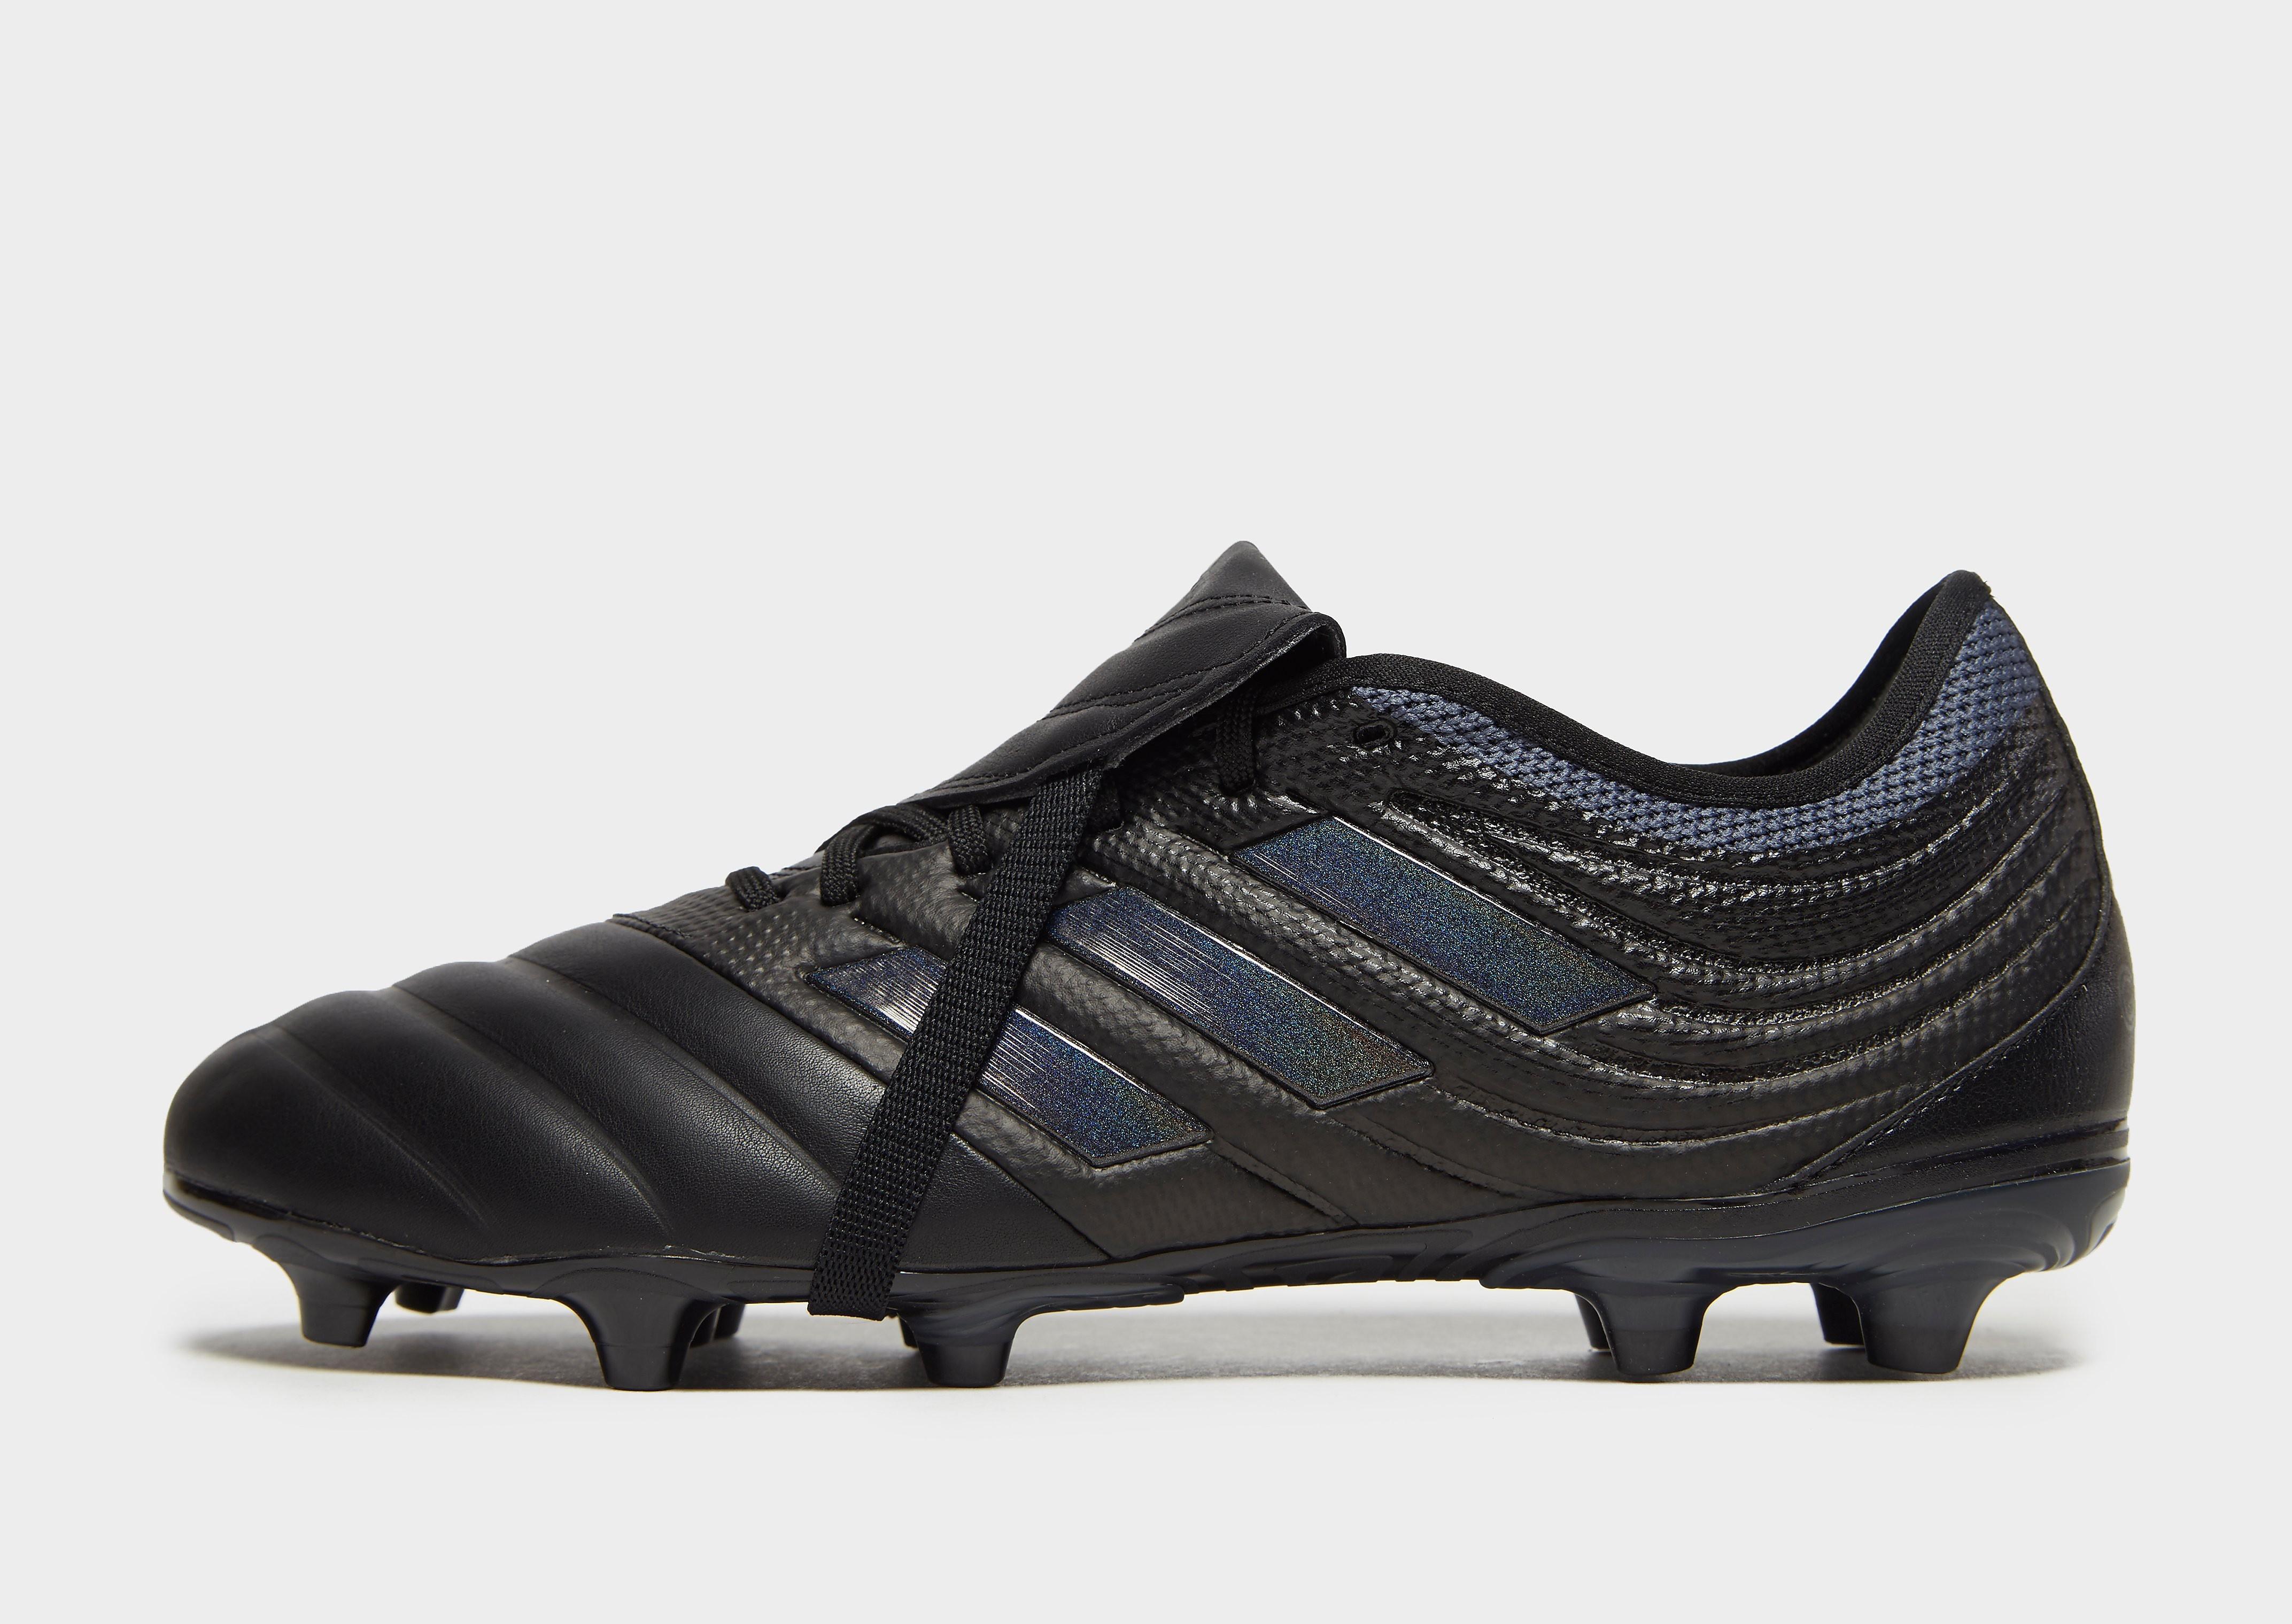 ADIDAS Copa Gloro 19.2 Firm Ground Boots